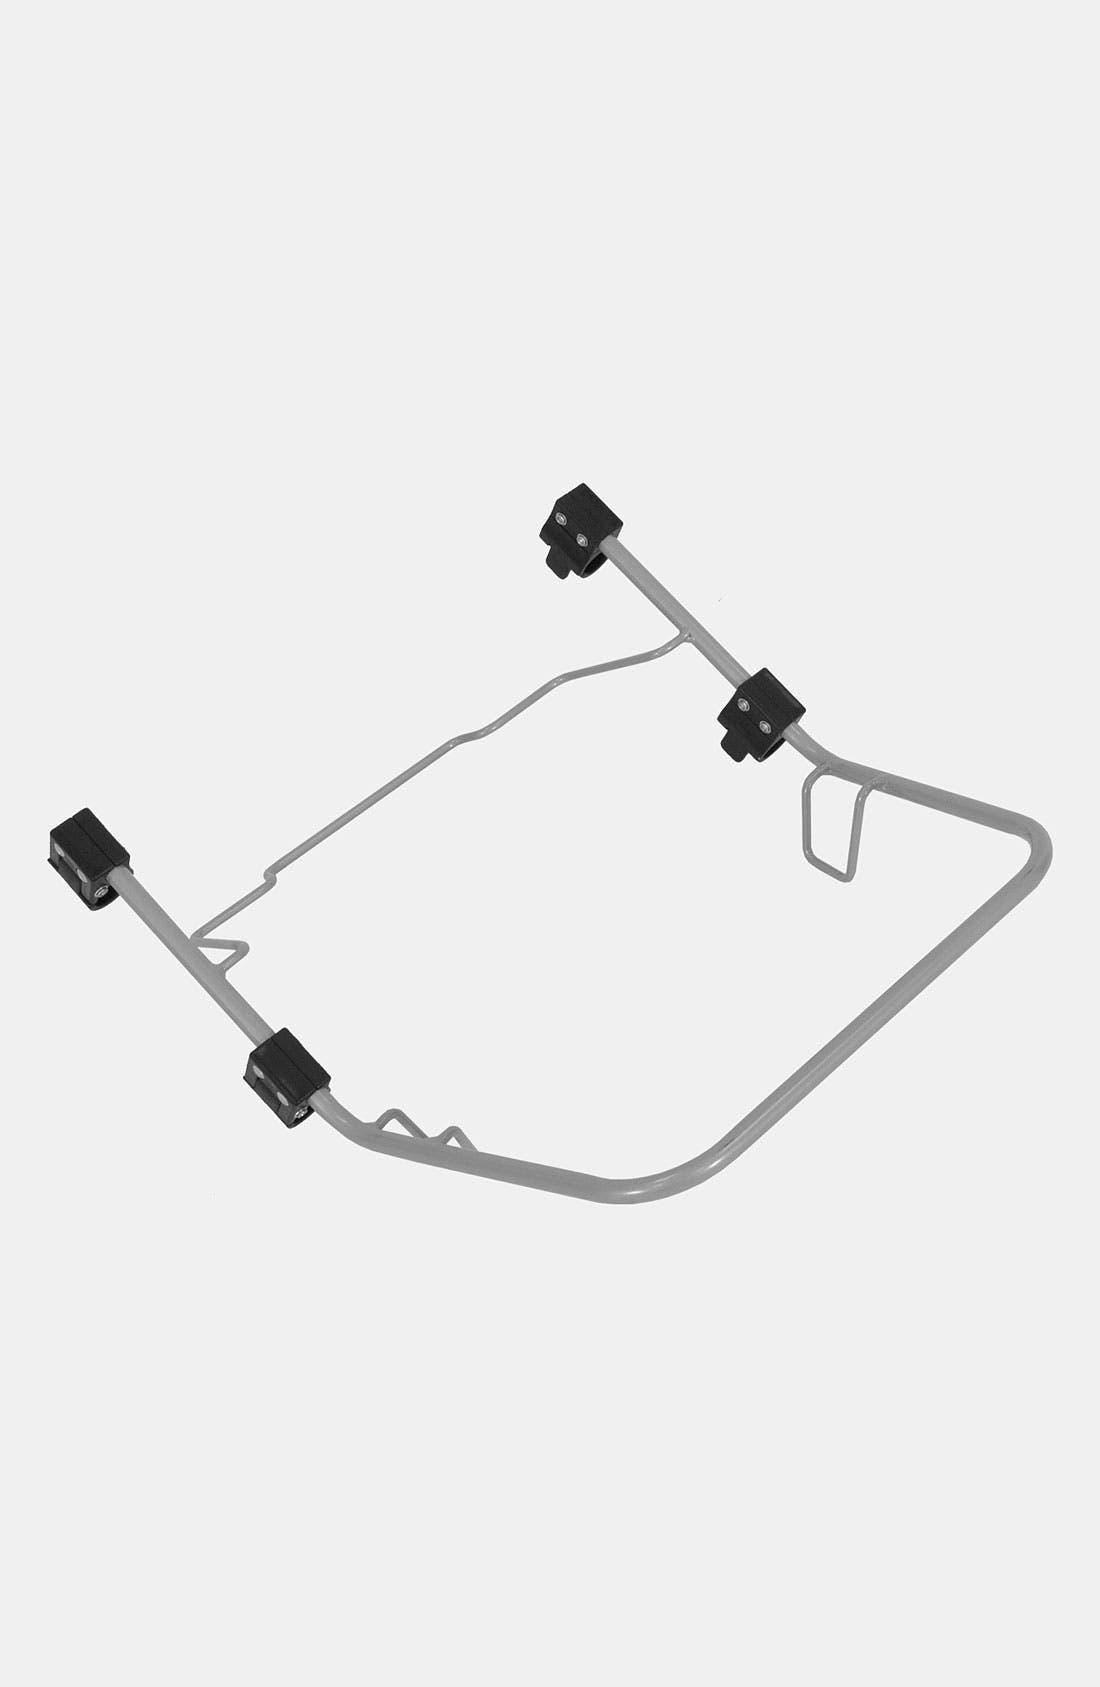 Alternate Image 1 Selected - Joovy 'Zoom 360' Chicco® Car Seat Adaptor